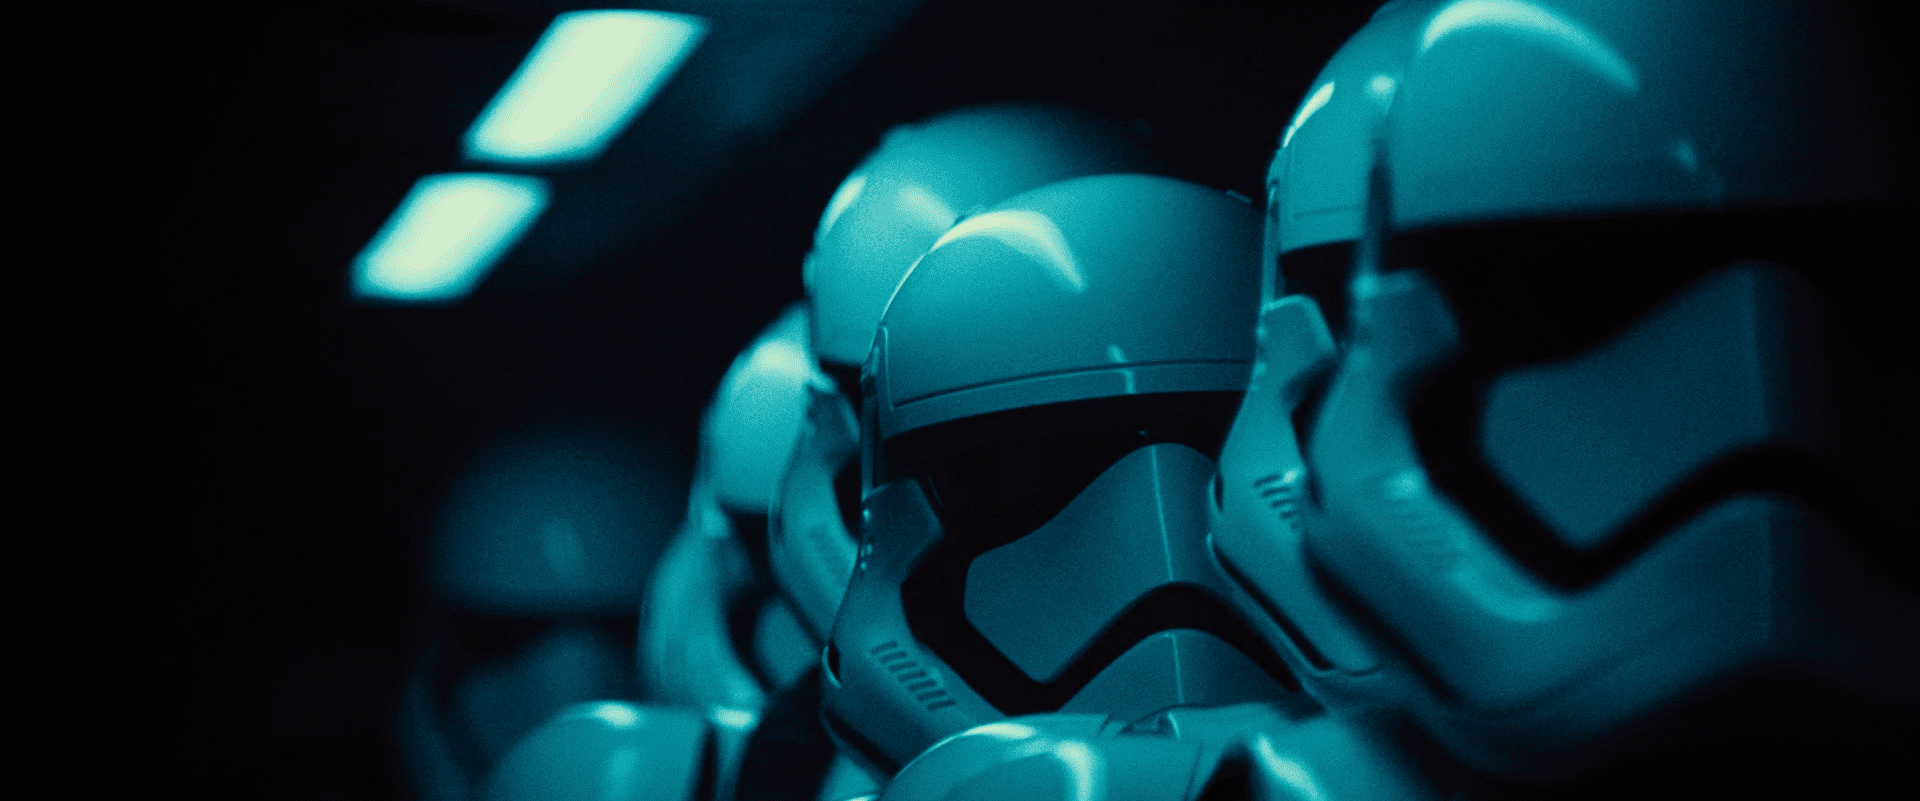 Star Wars Episode VII The Force Awakens Wallpaper 006